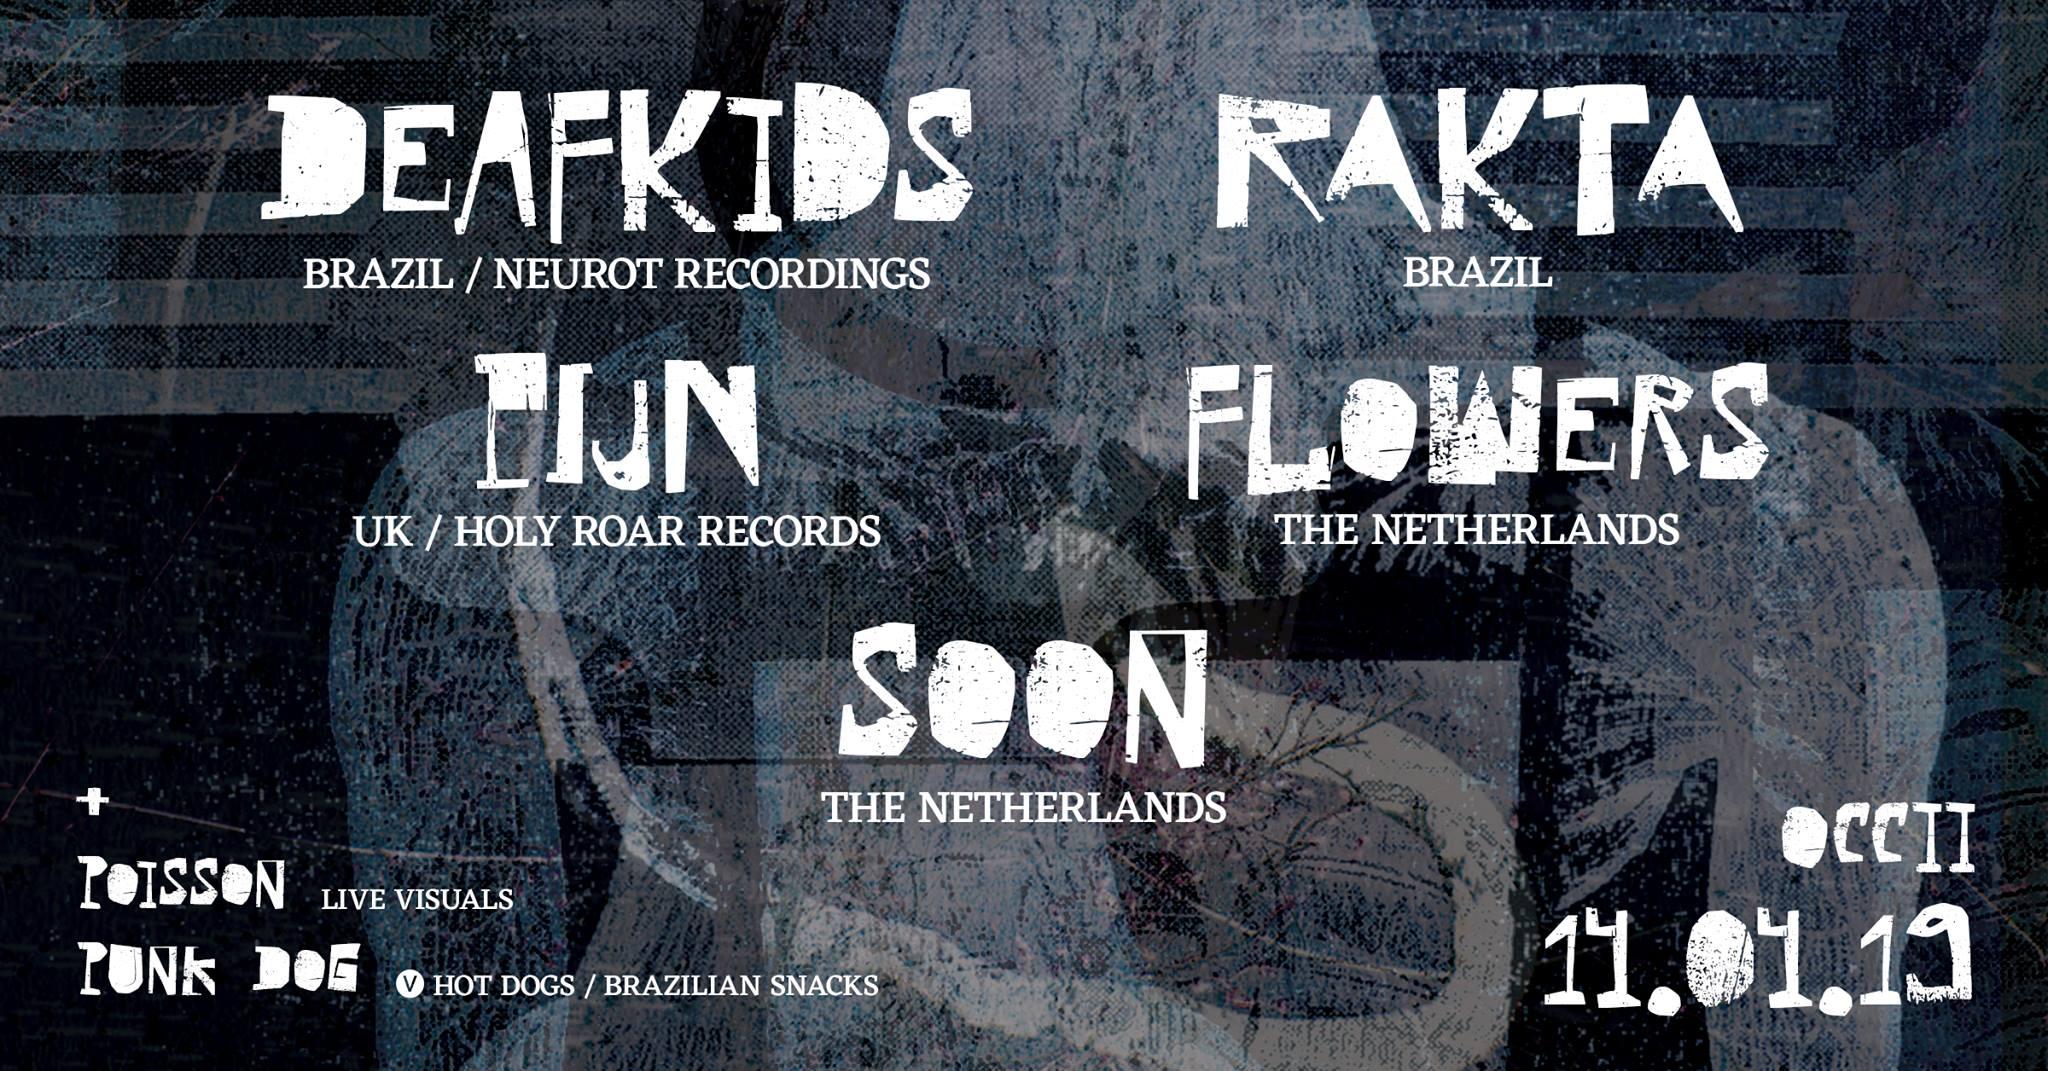 DEAF KIDS (BR) + RAKTA (BR) + FLOWERS + PIJN (UK) + SOON